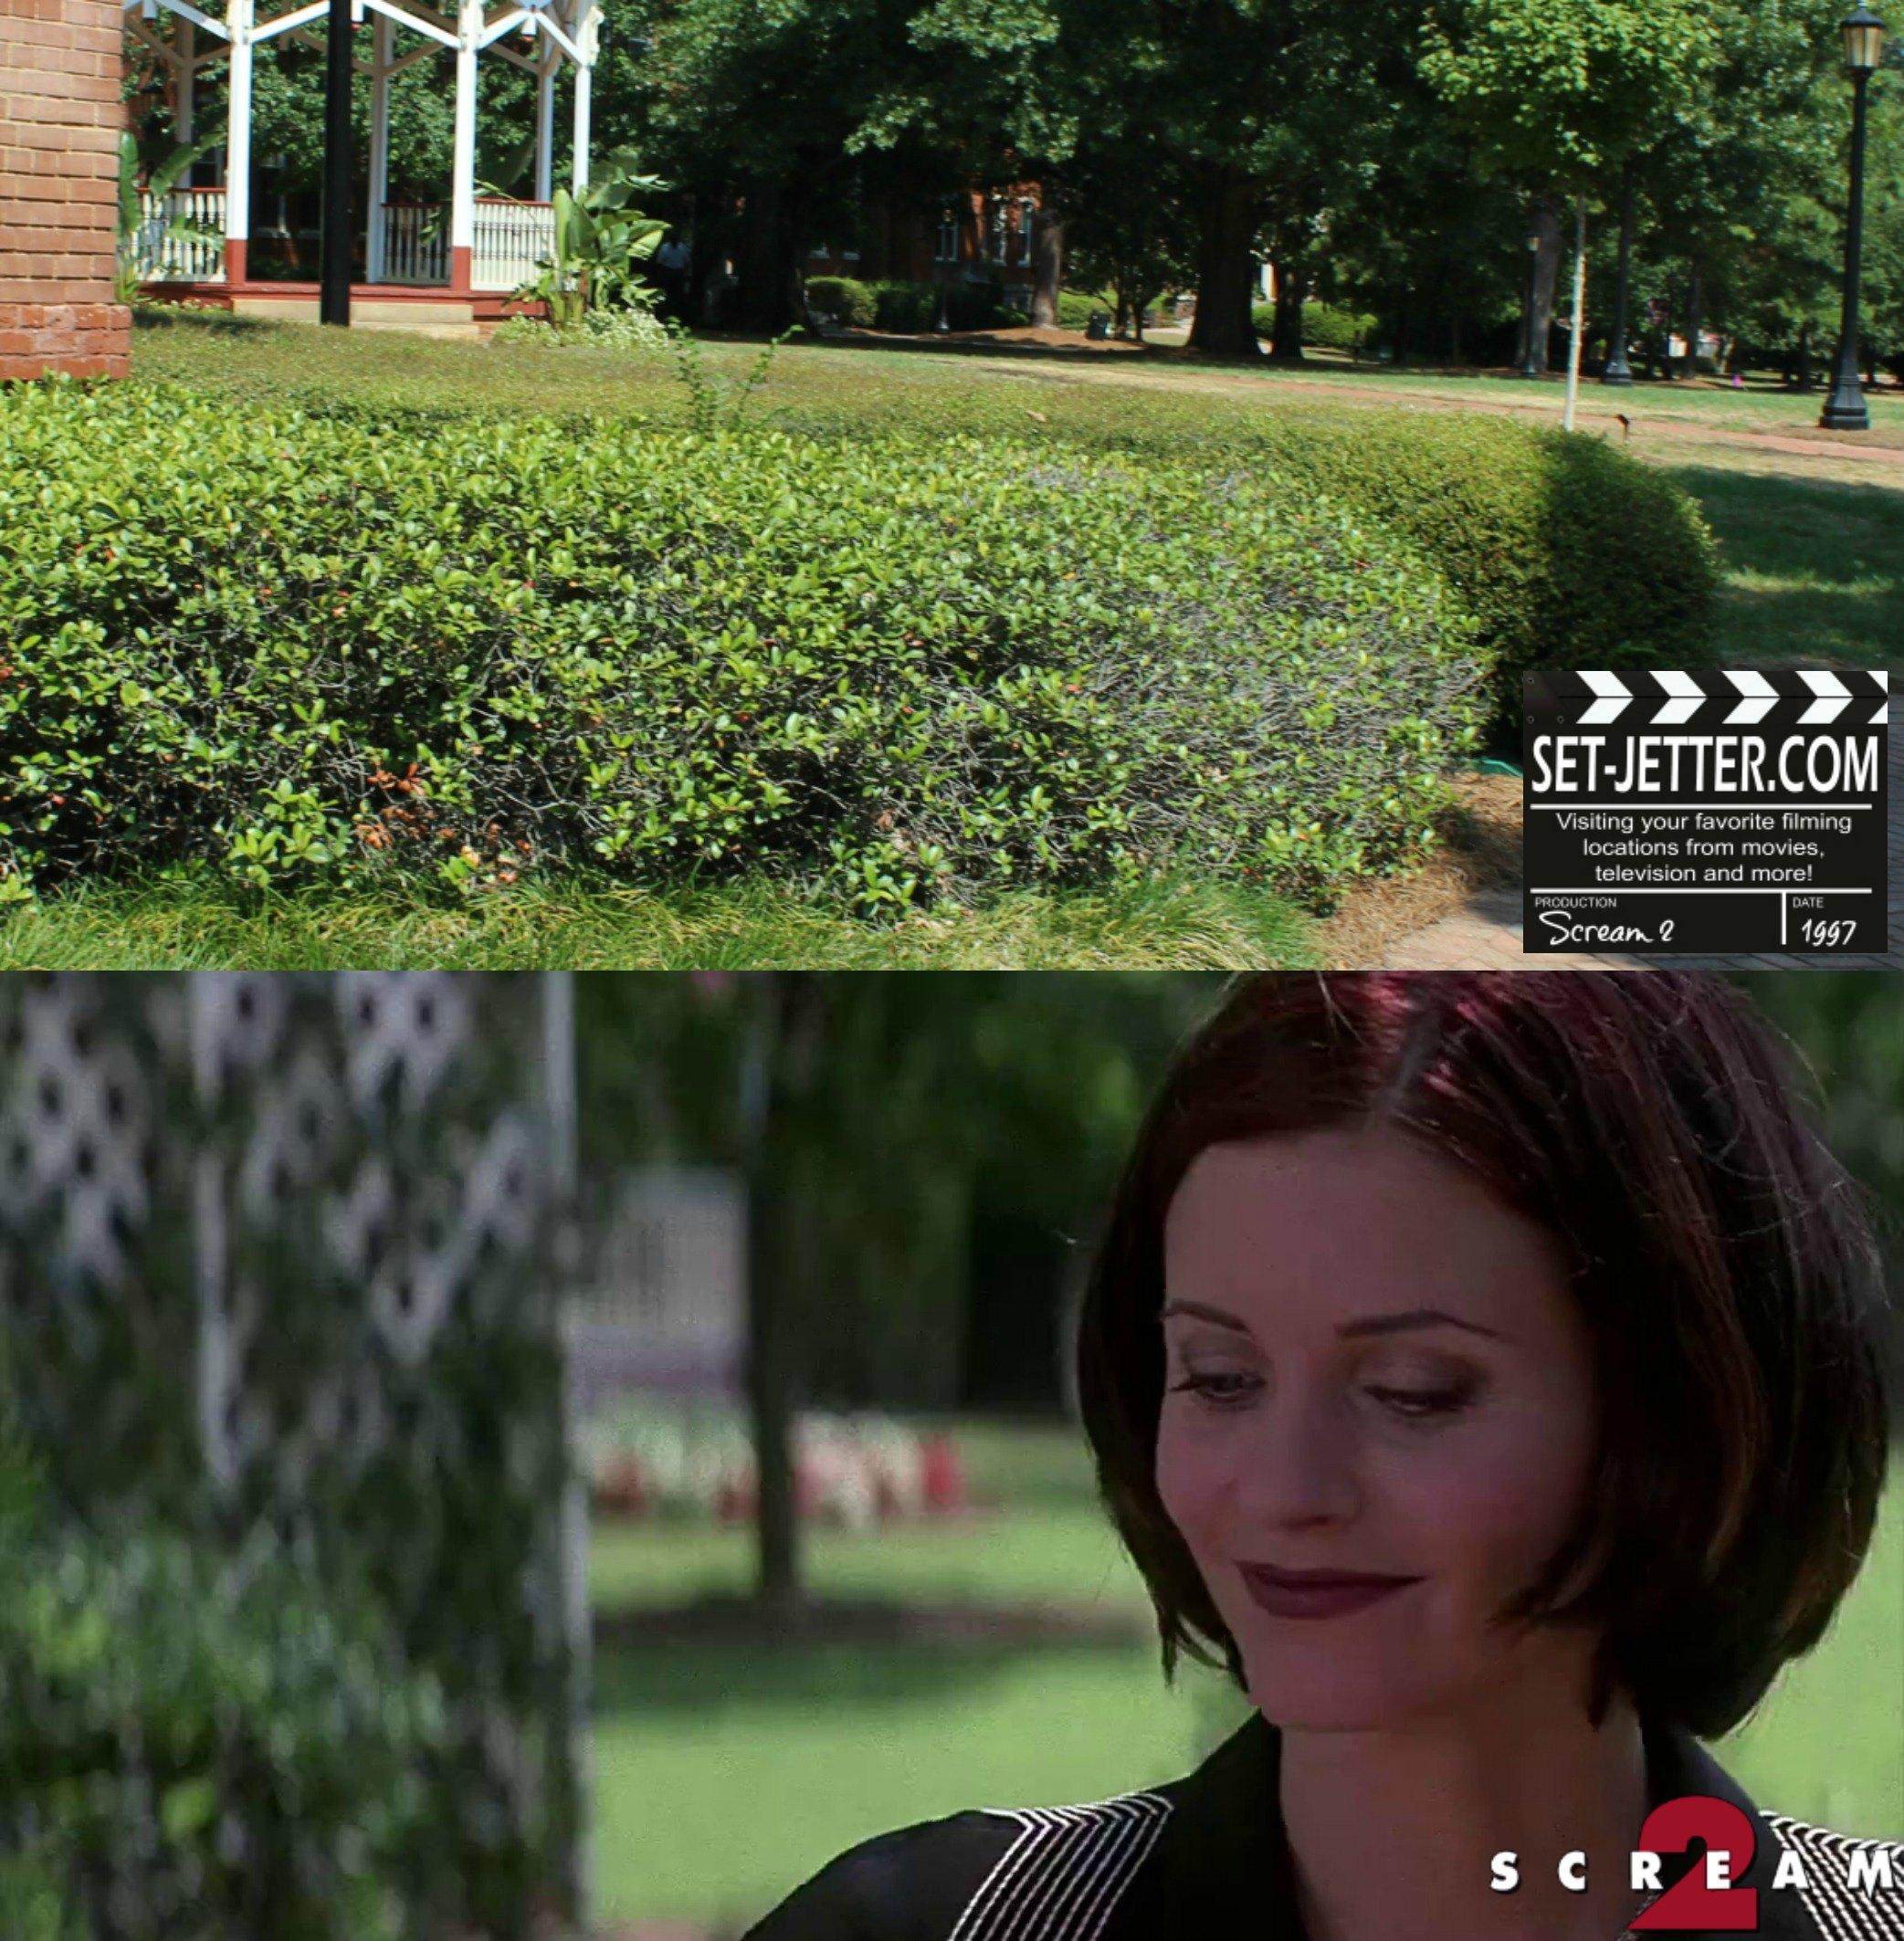 Scream 2 comparison 103.jpg